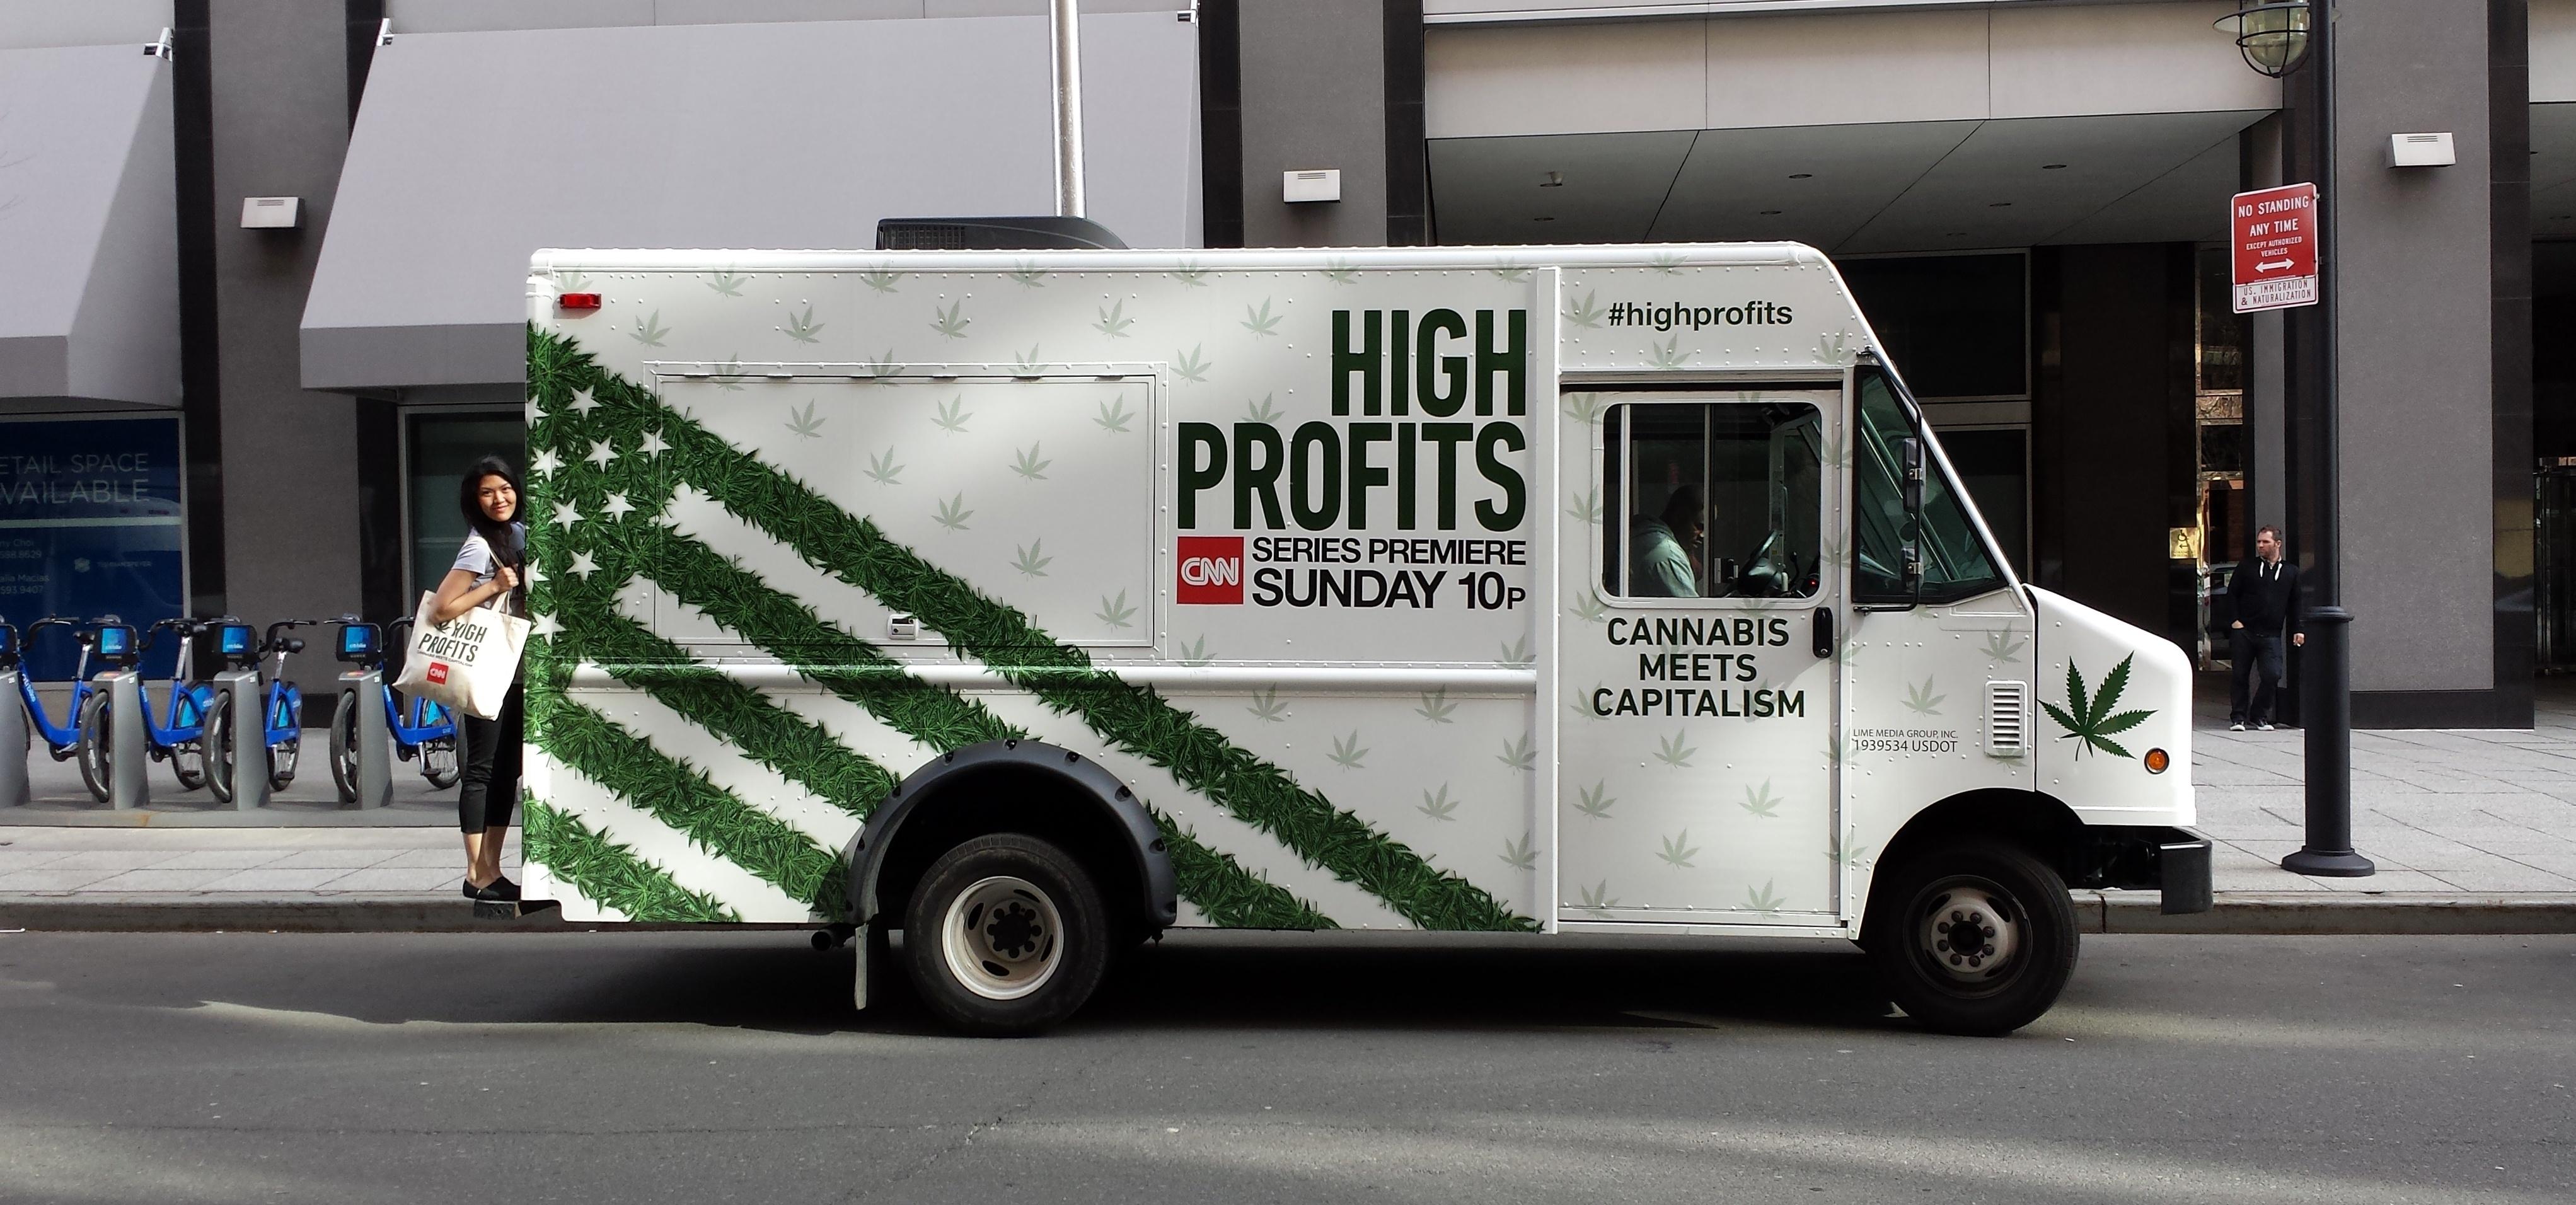 CNN High Profits Mobile Tour.jpg